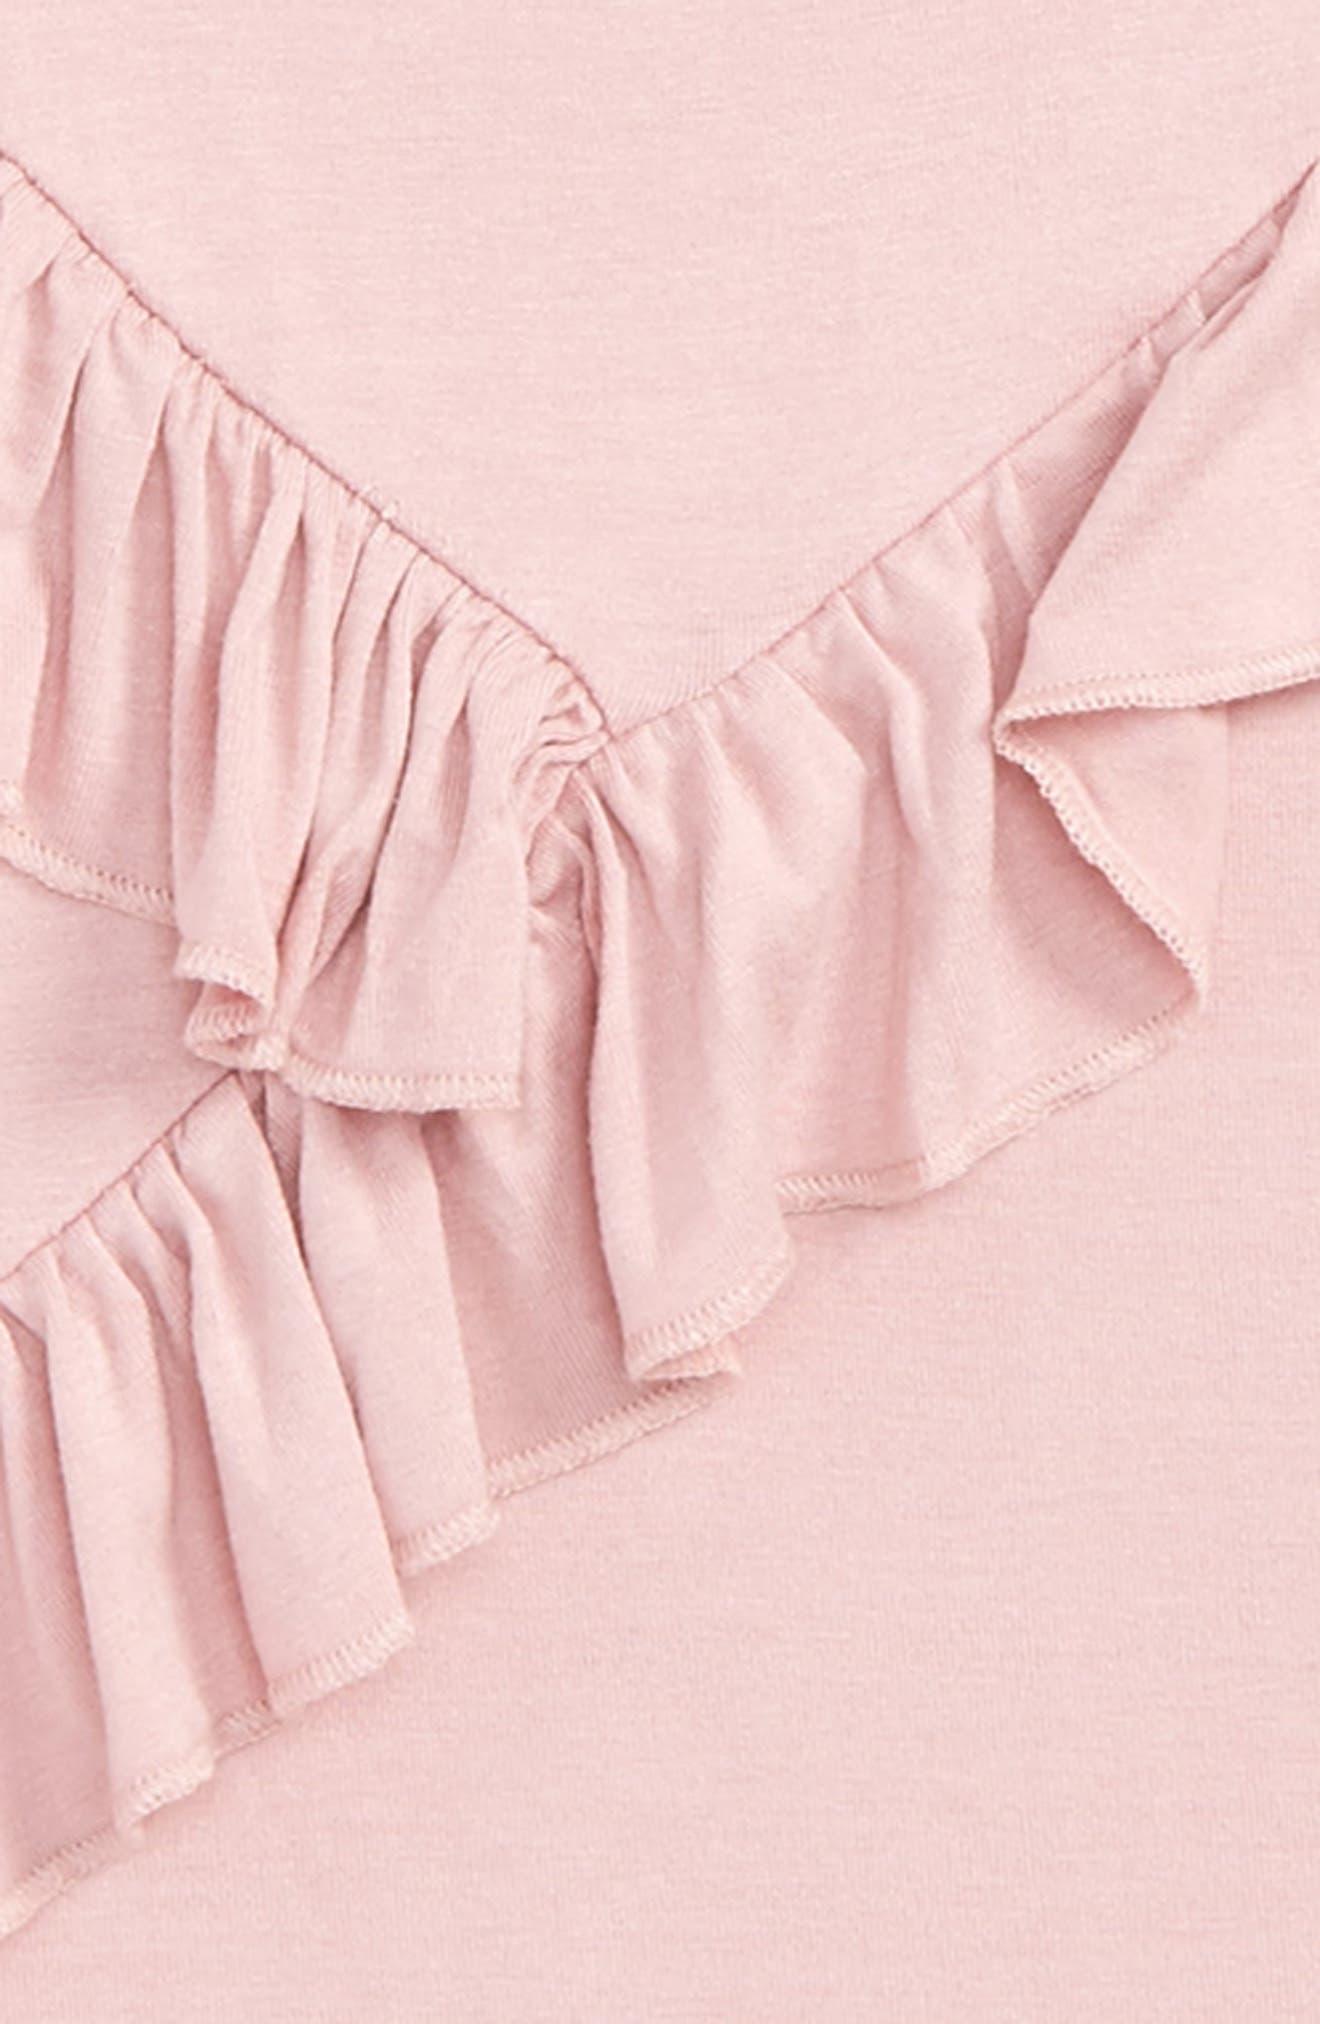 Ruffle Tee,                             Alternate thumbnail 2, color,                             Pink Zephyr